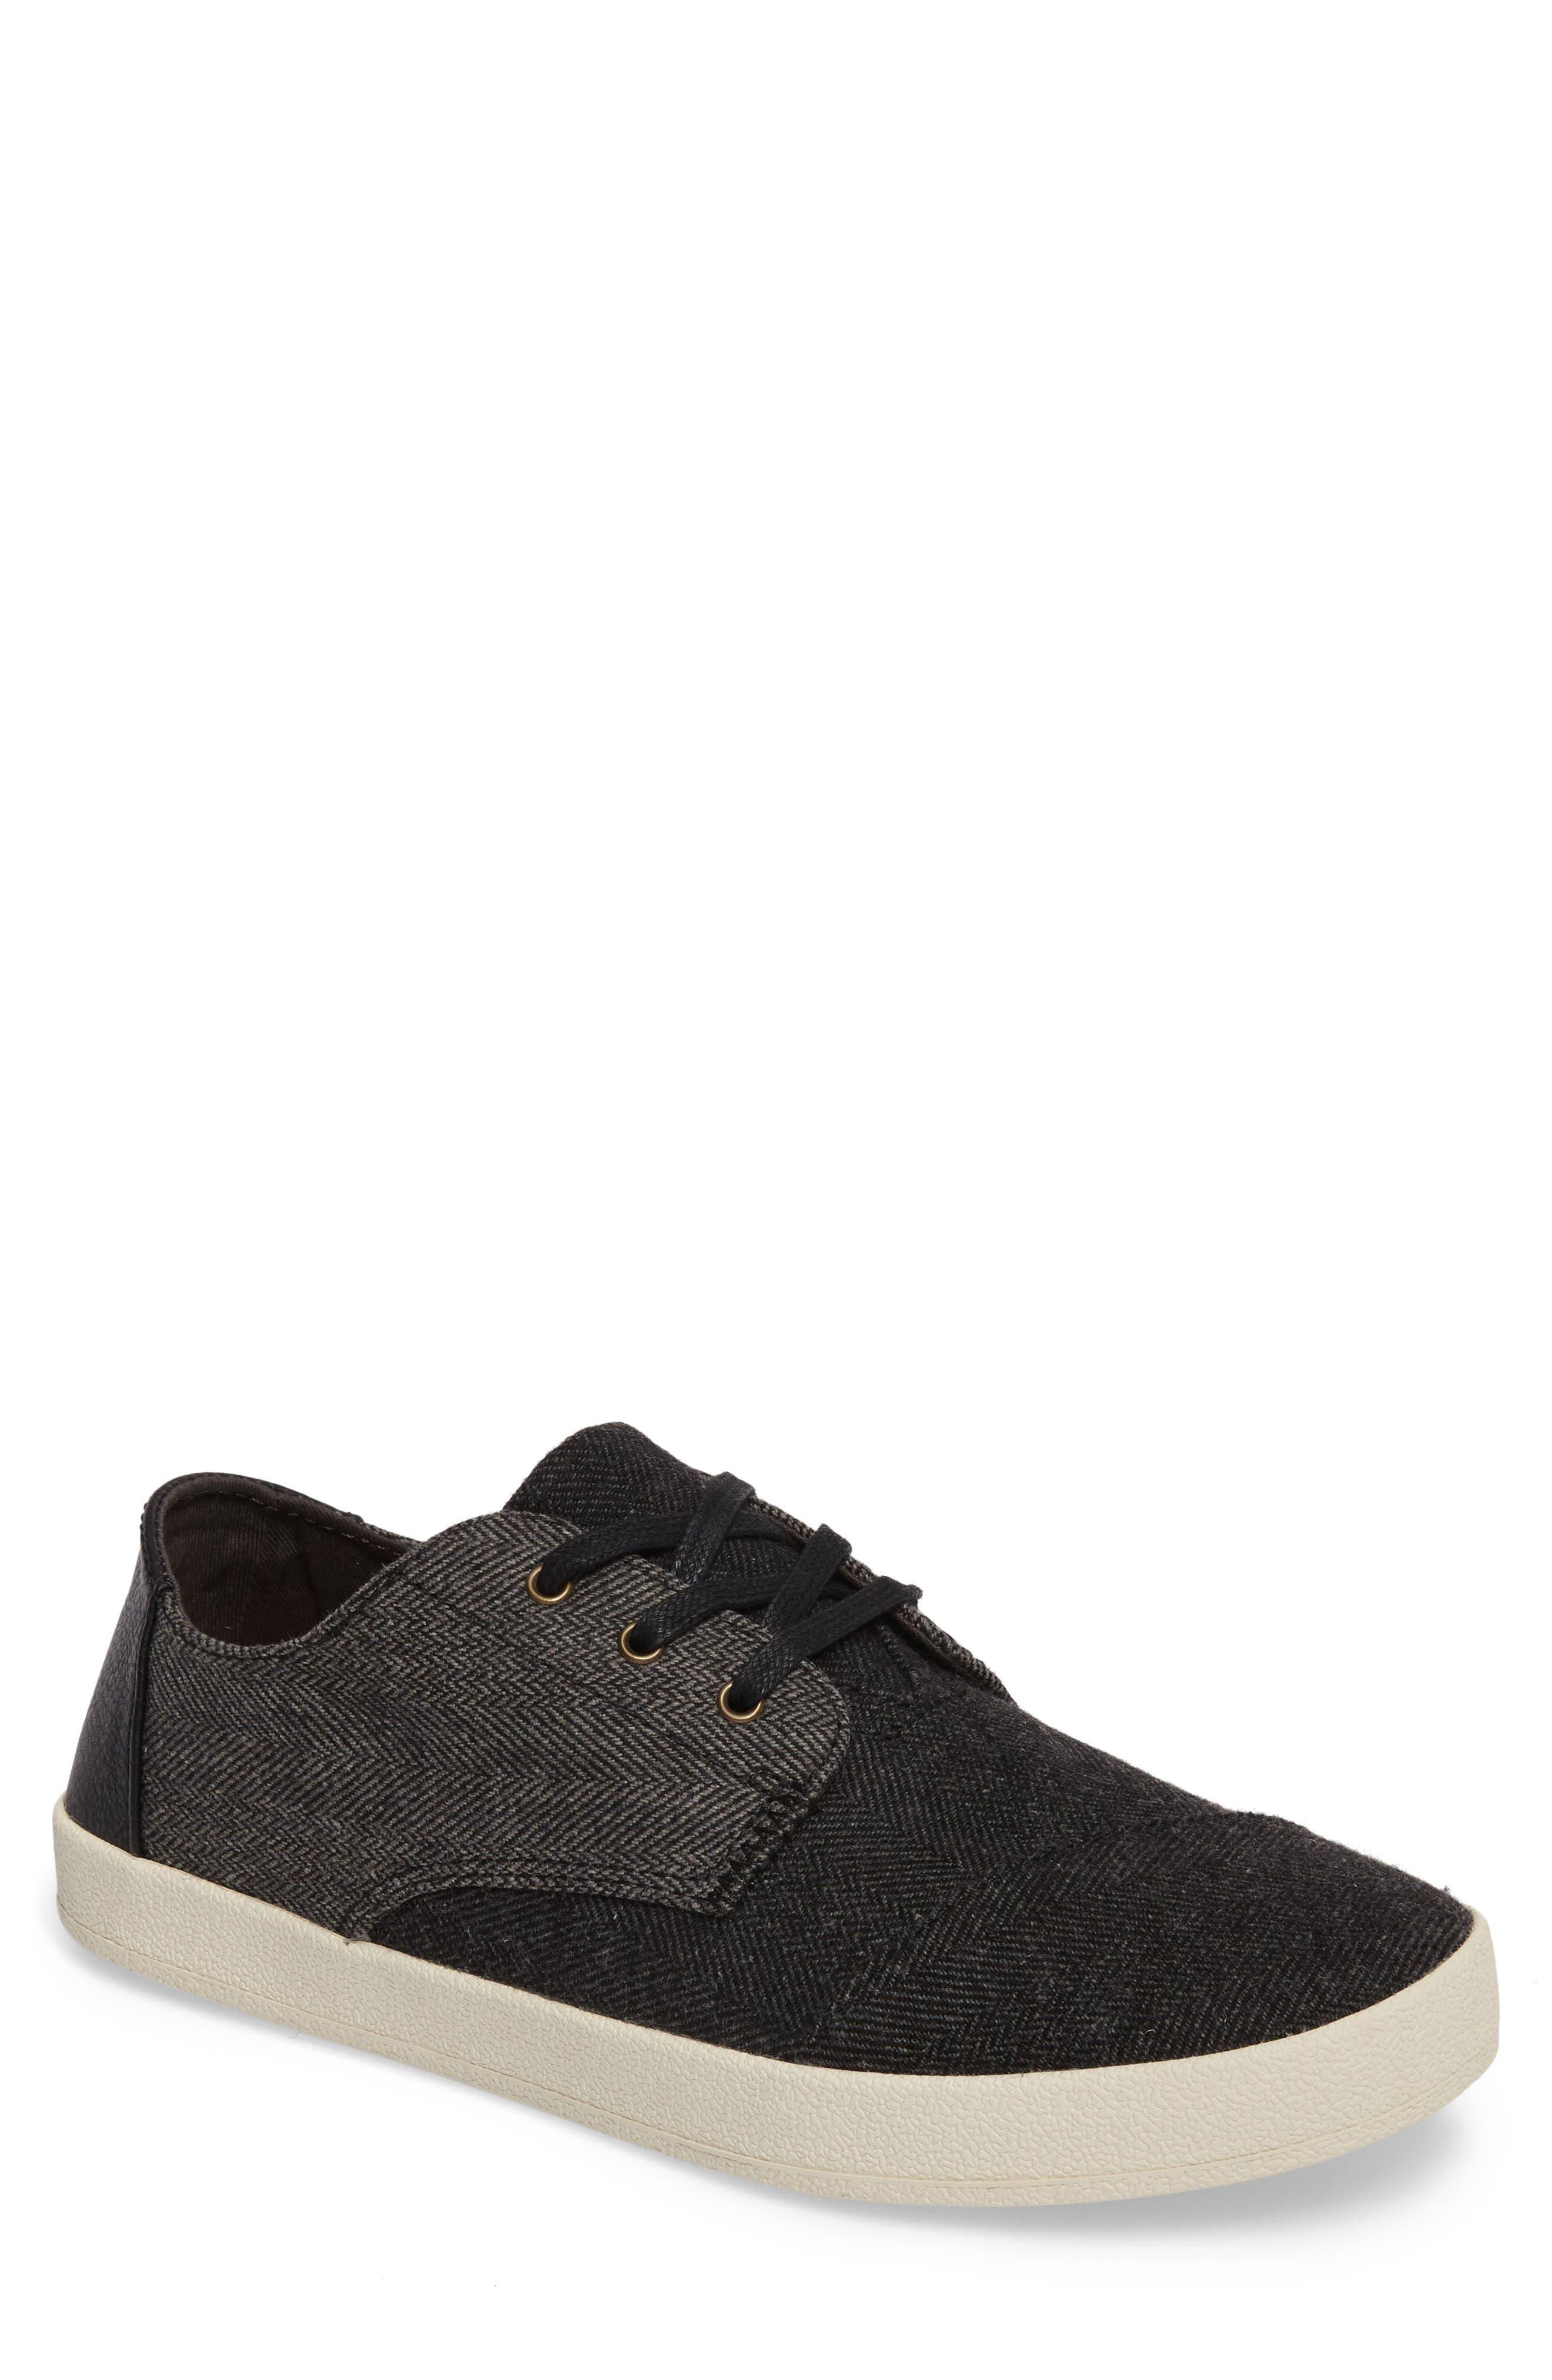 'Paseo' Sneaker,                         Main,                         color, Black/ Grey